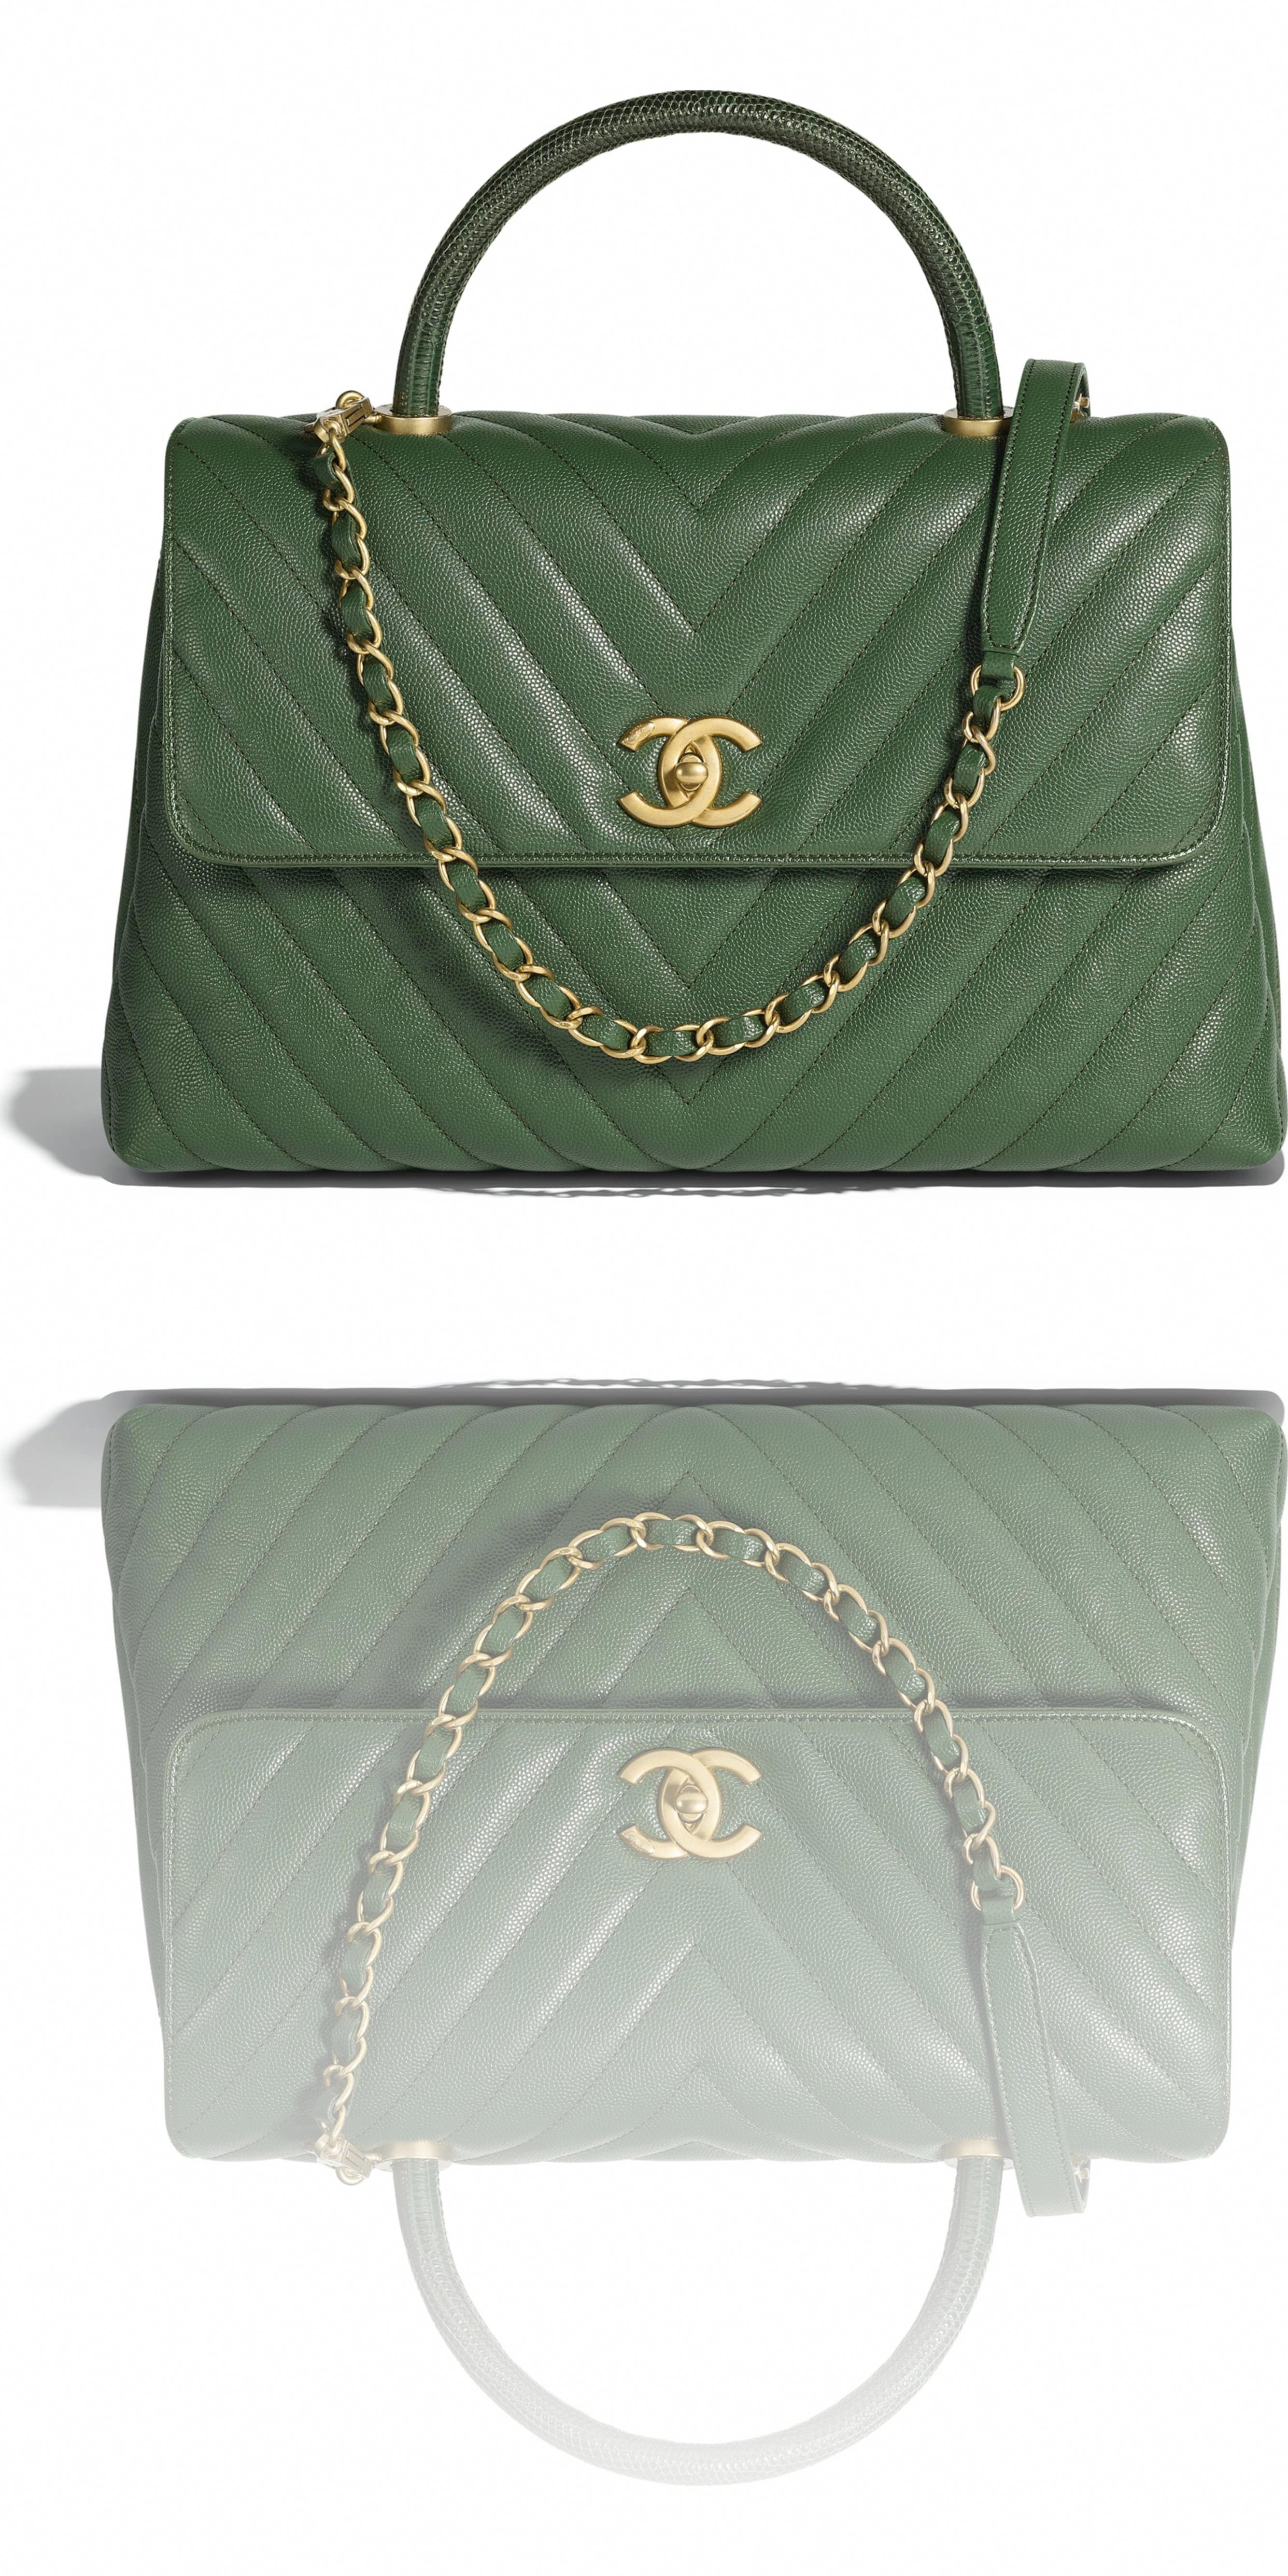 3291384826a3 Chanel handbag or Chanel handbags macys then Visit internet site press the  link for more information _ #ladiesdesignerbagsdesignerhandbag